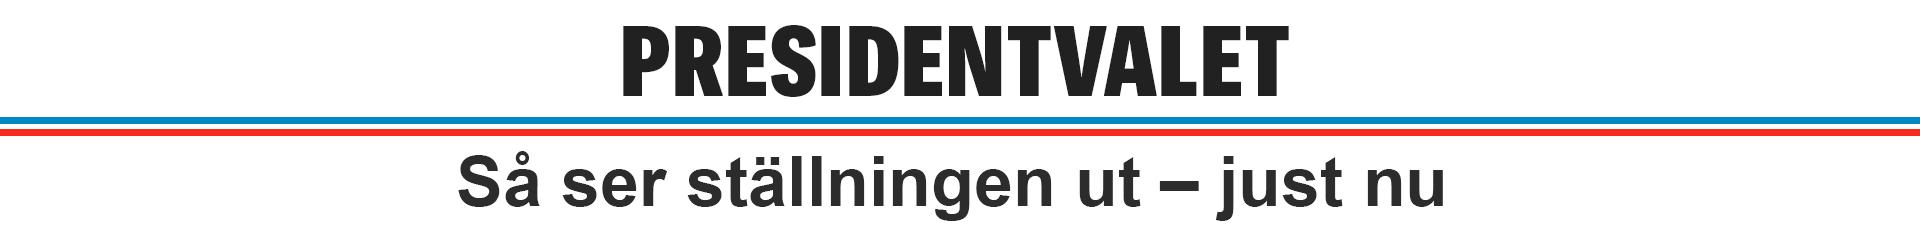 Presidentvalet - resultatet just nu